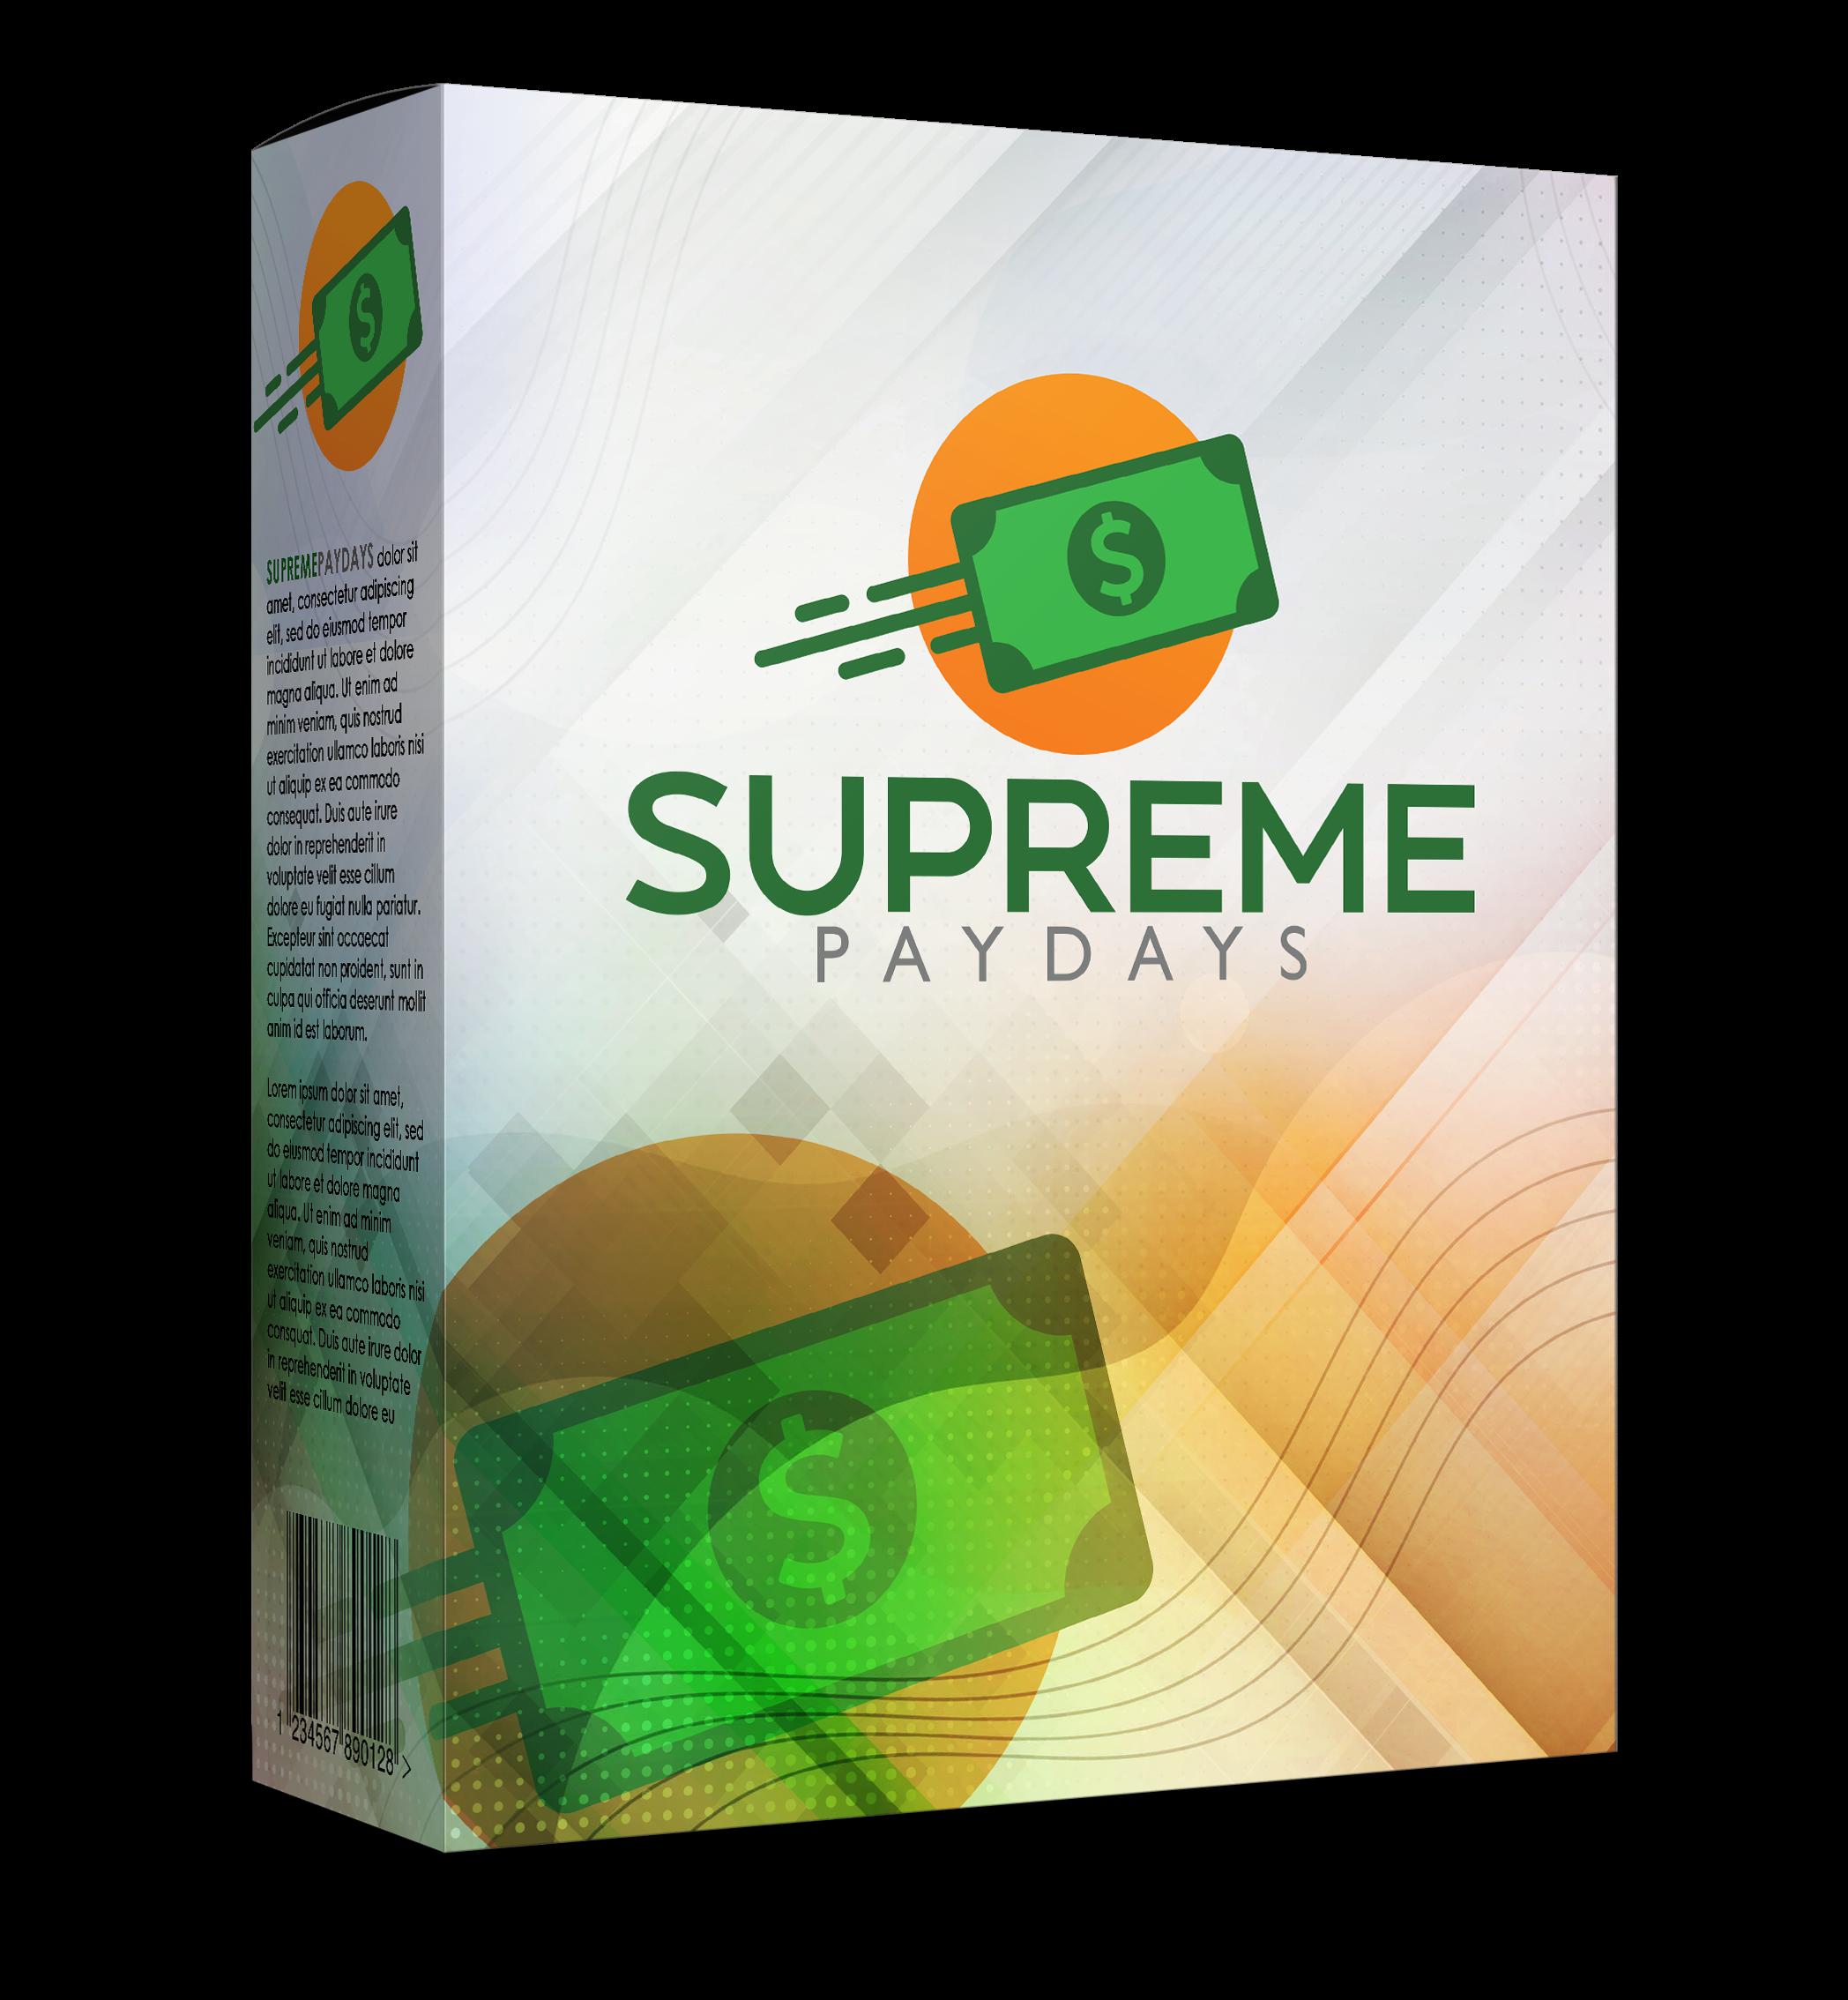 Supreme Paydays